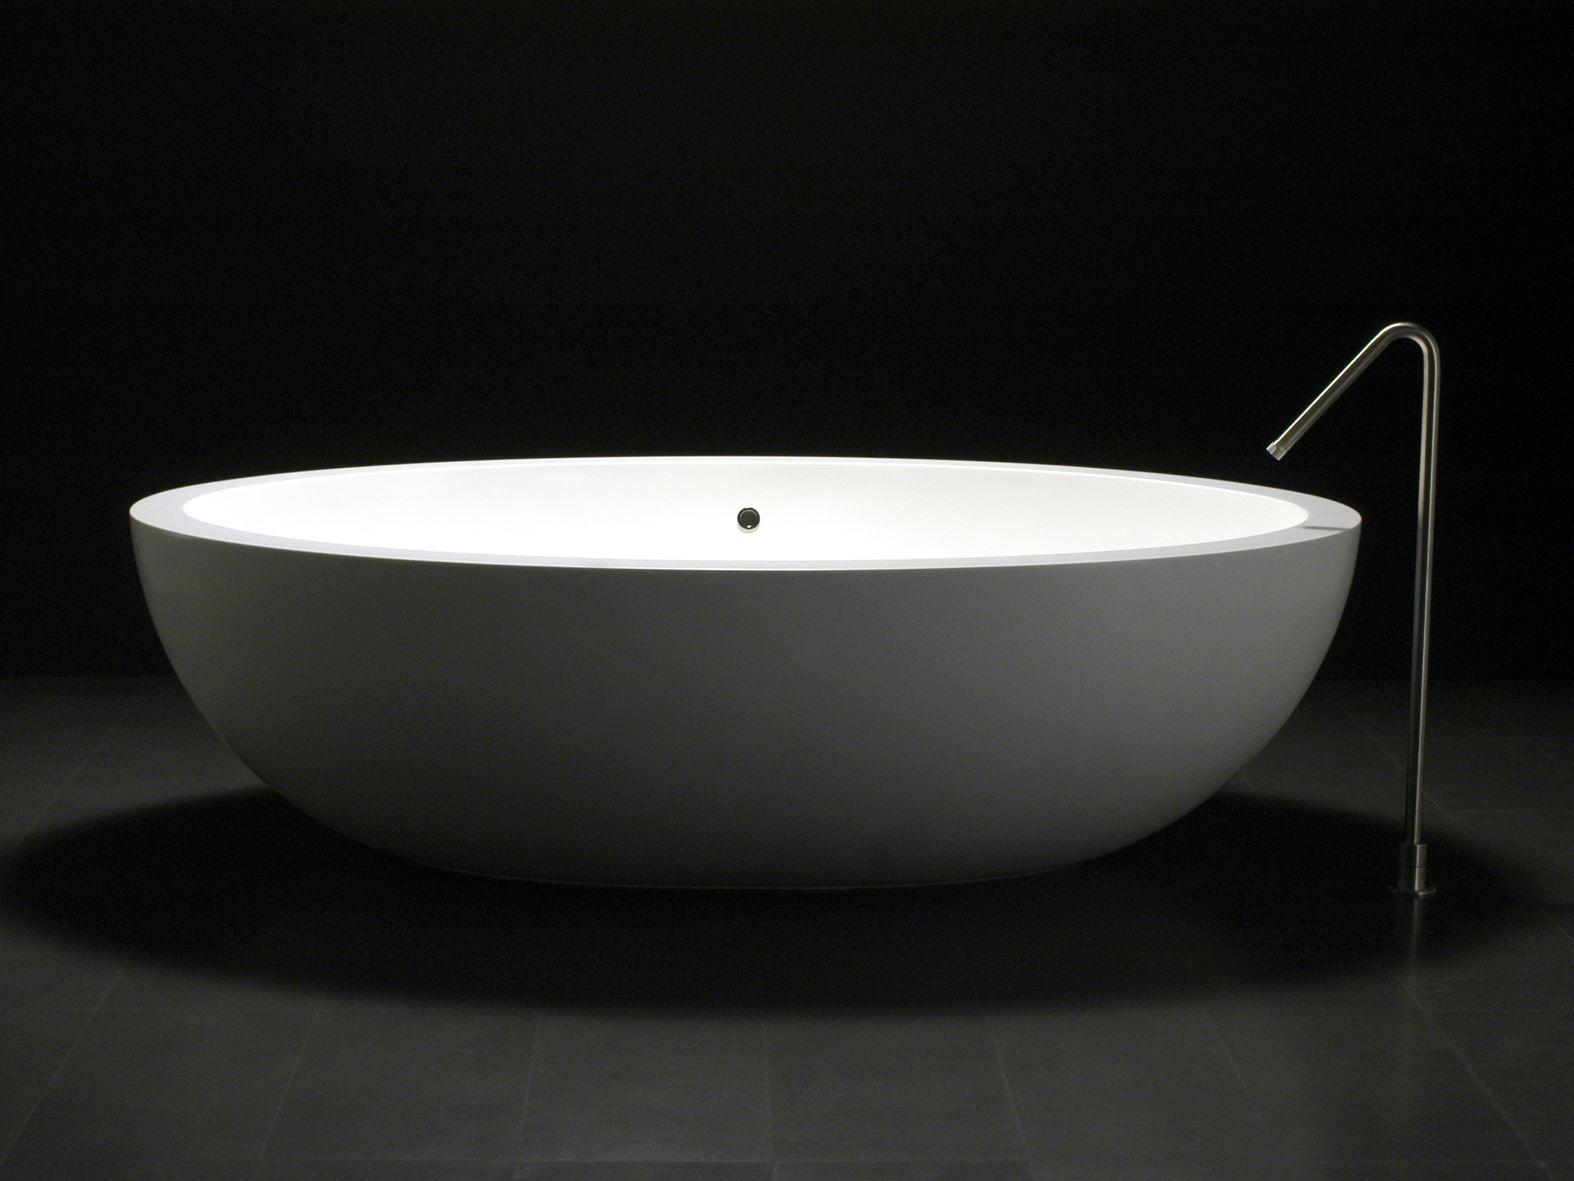 Vasca Da Bagno Freestanding Corian : Vasca da bagno in corian i fiumi collezione vasche by boffi